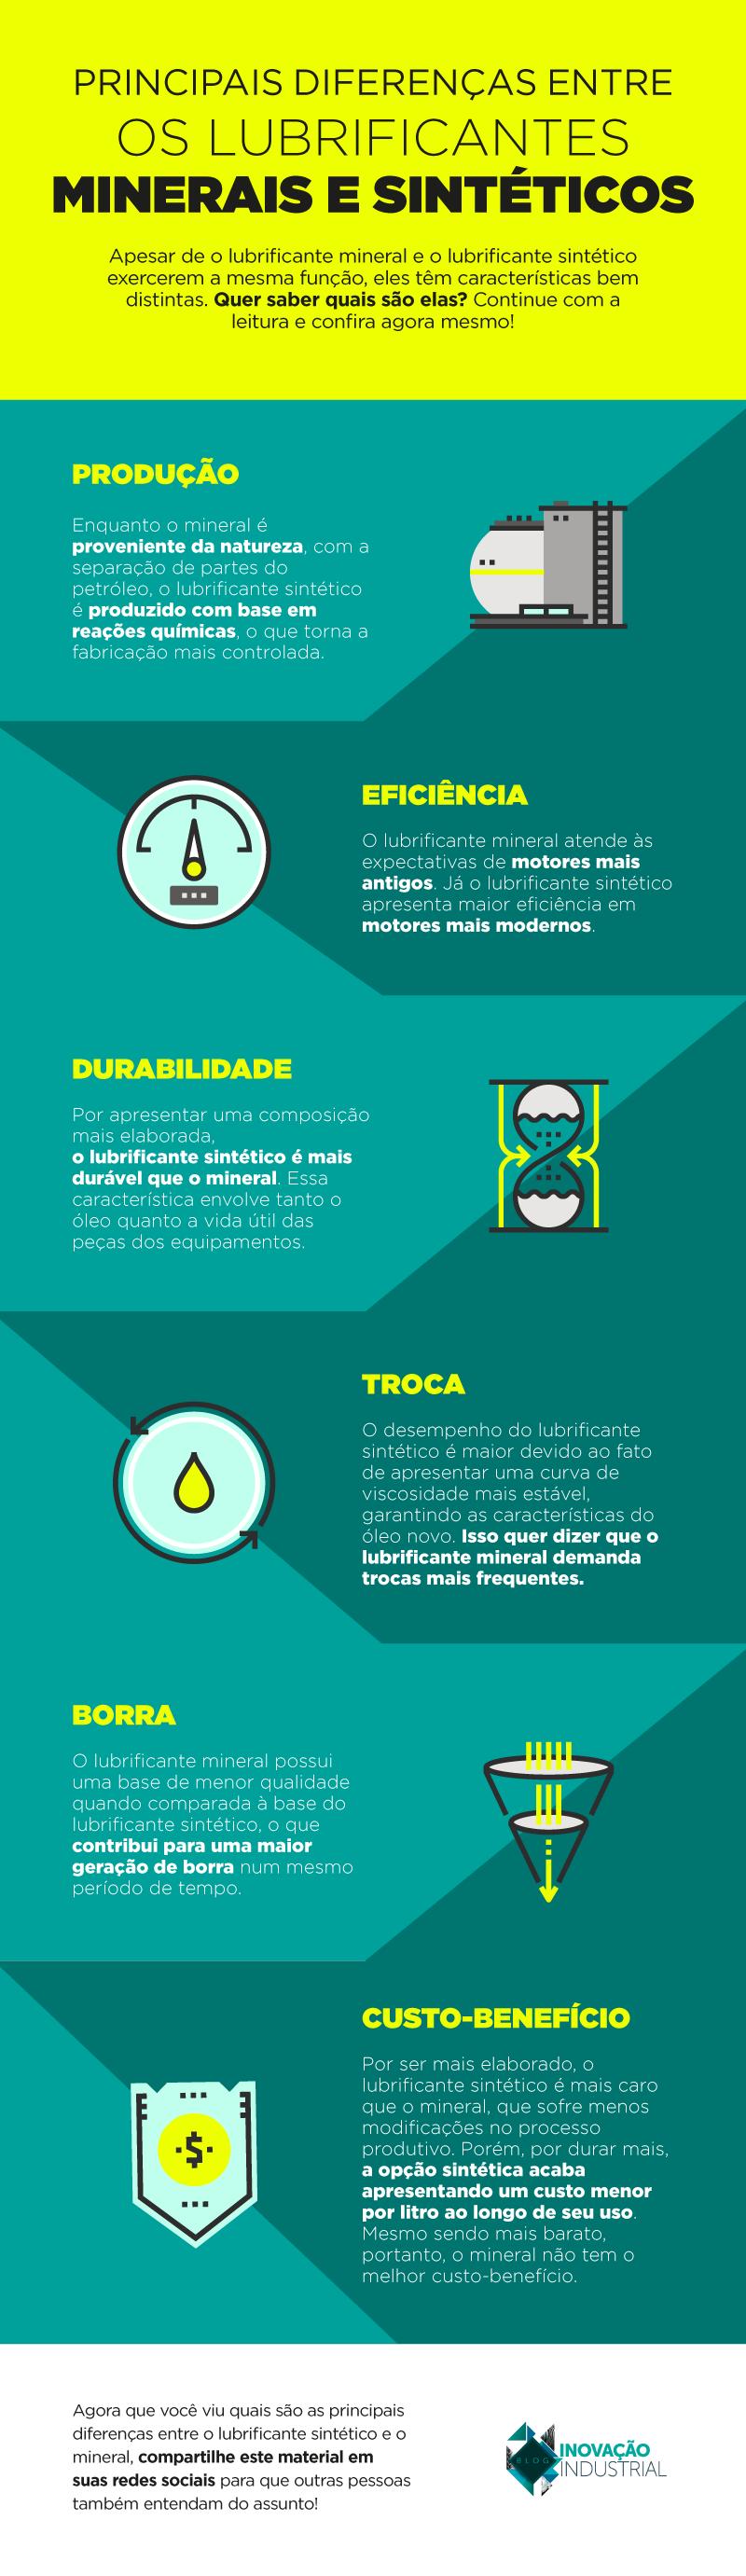 diferenças-entre-os-lubrificantes-minerais-e-sinteticos